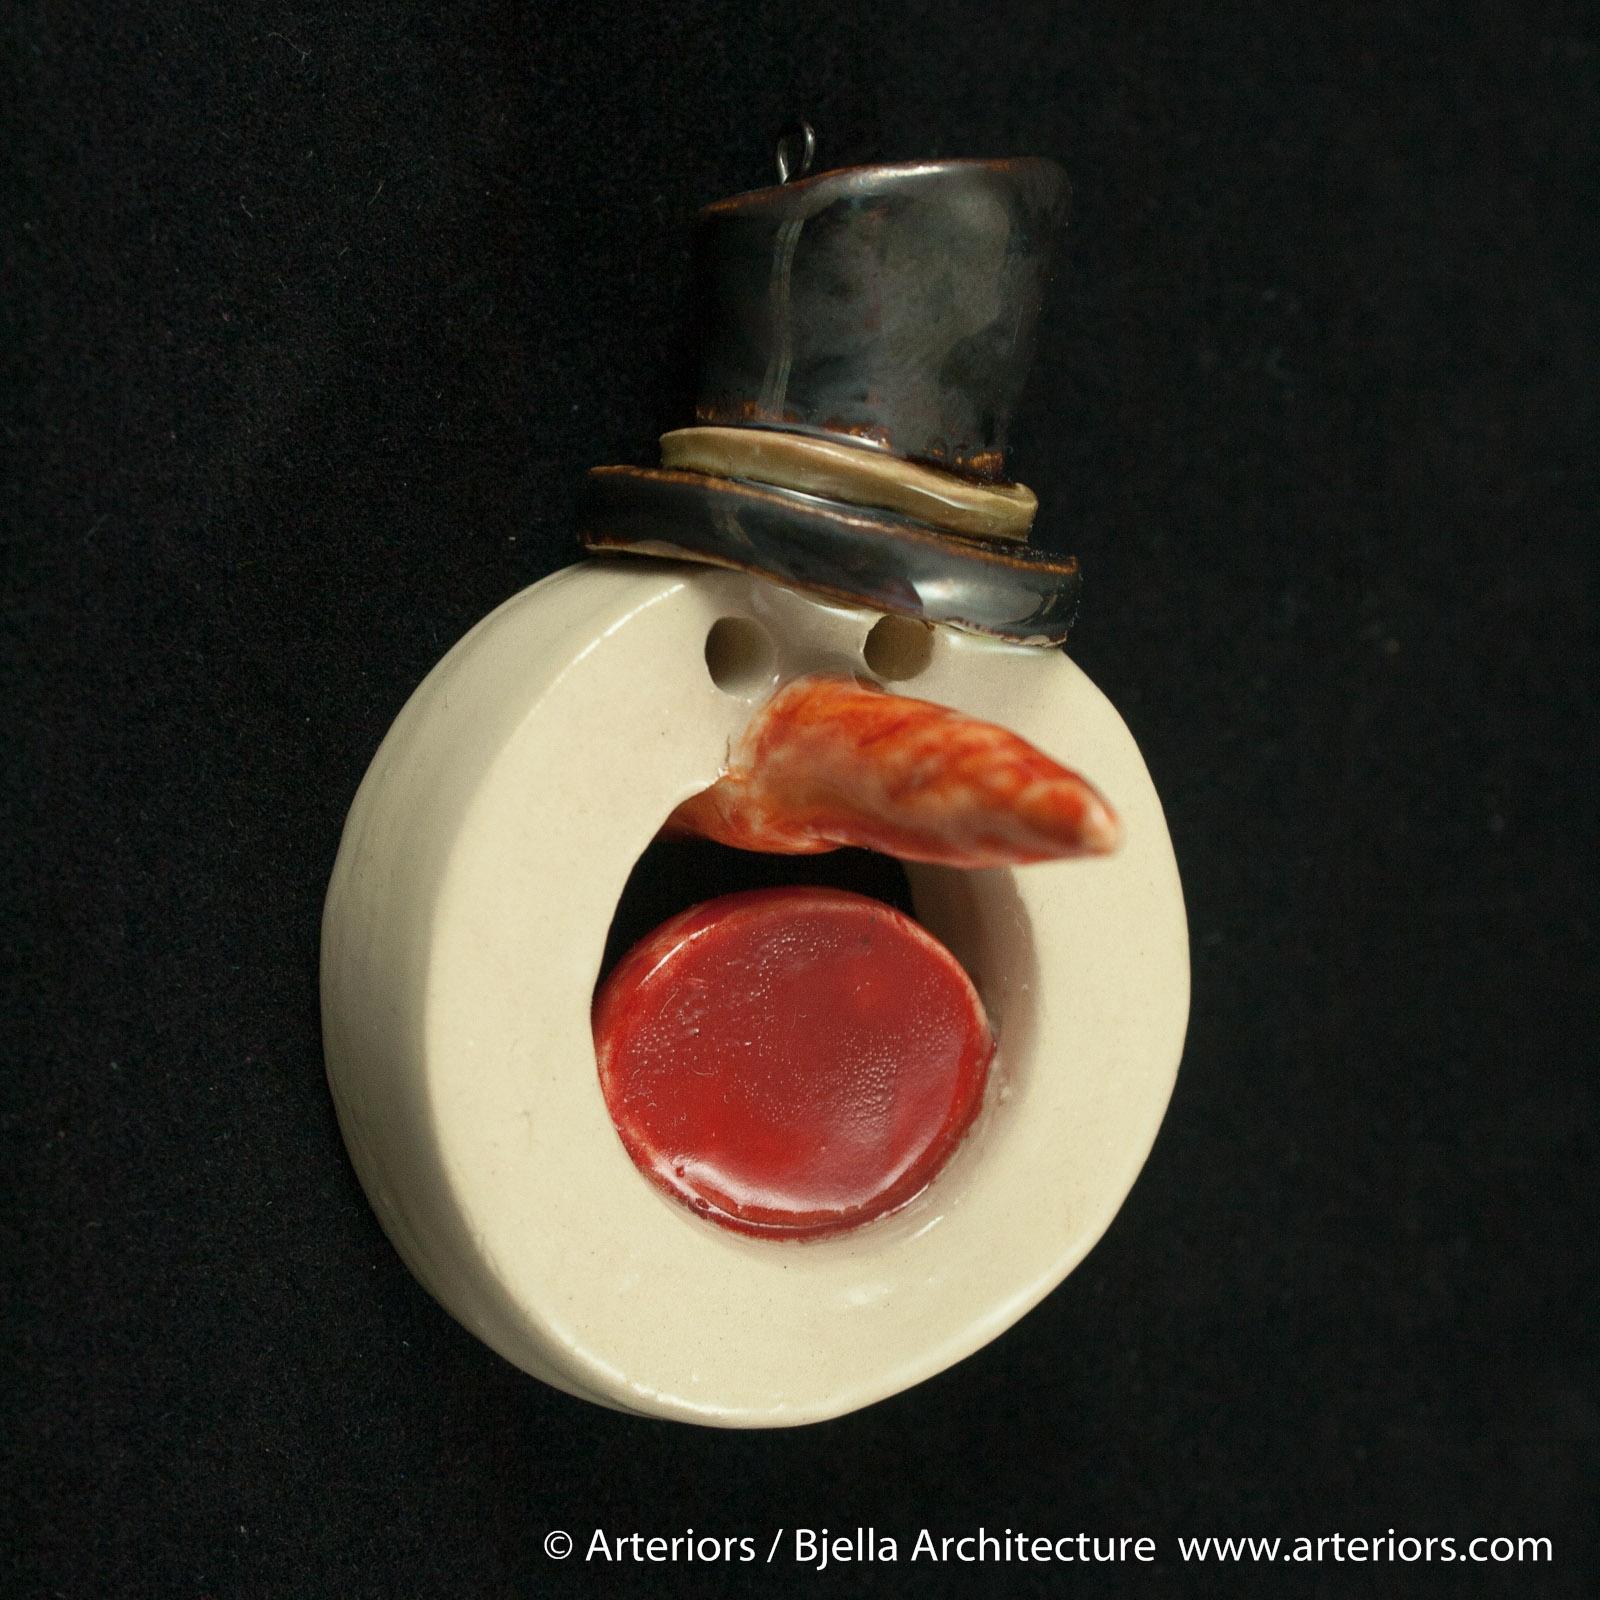 Bjella Snowman Ornament - Day 5 - Rings-16